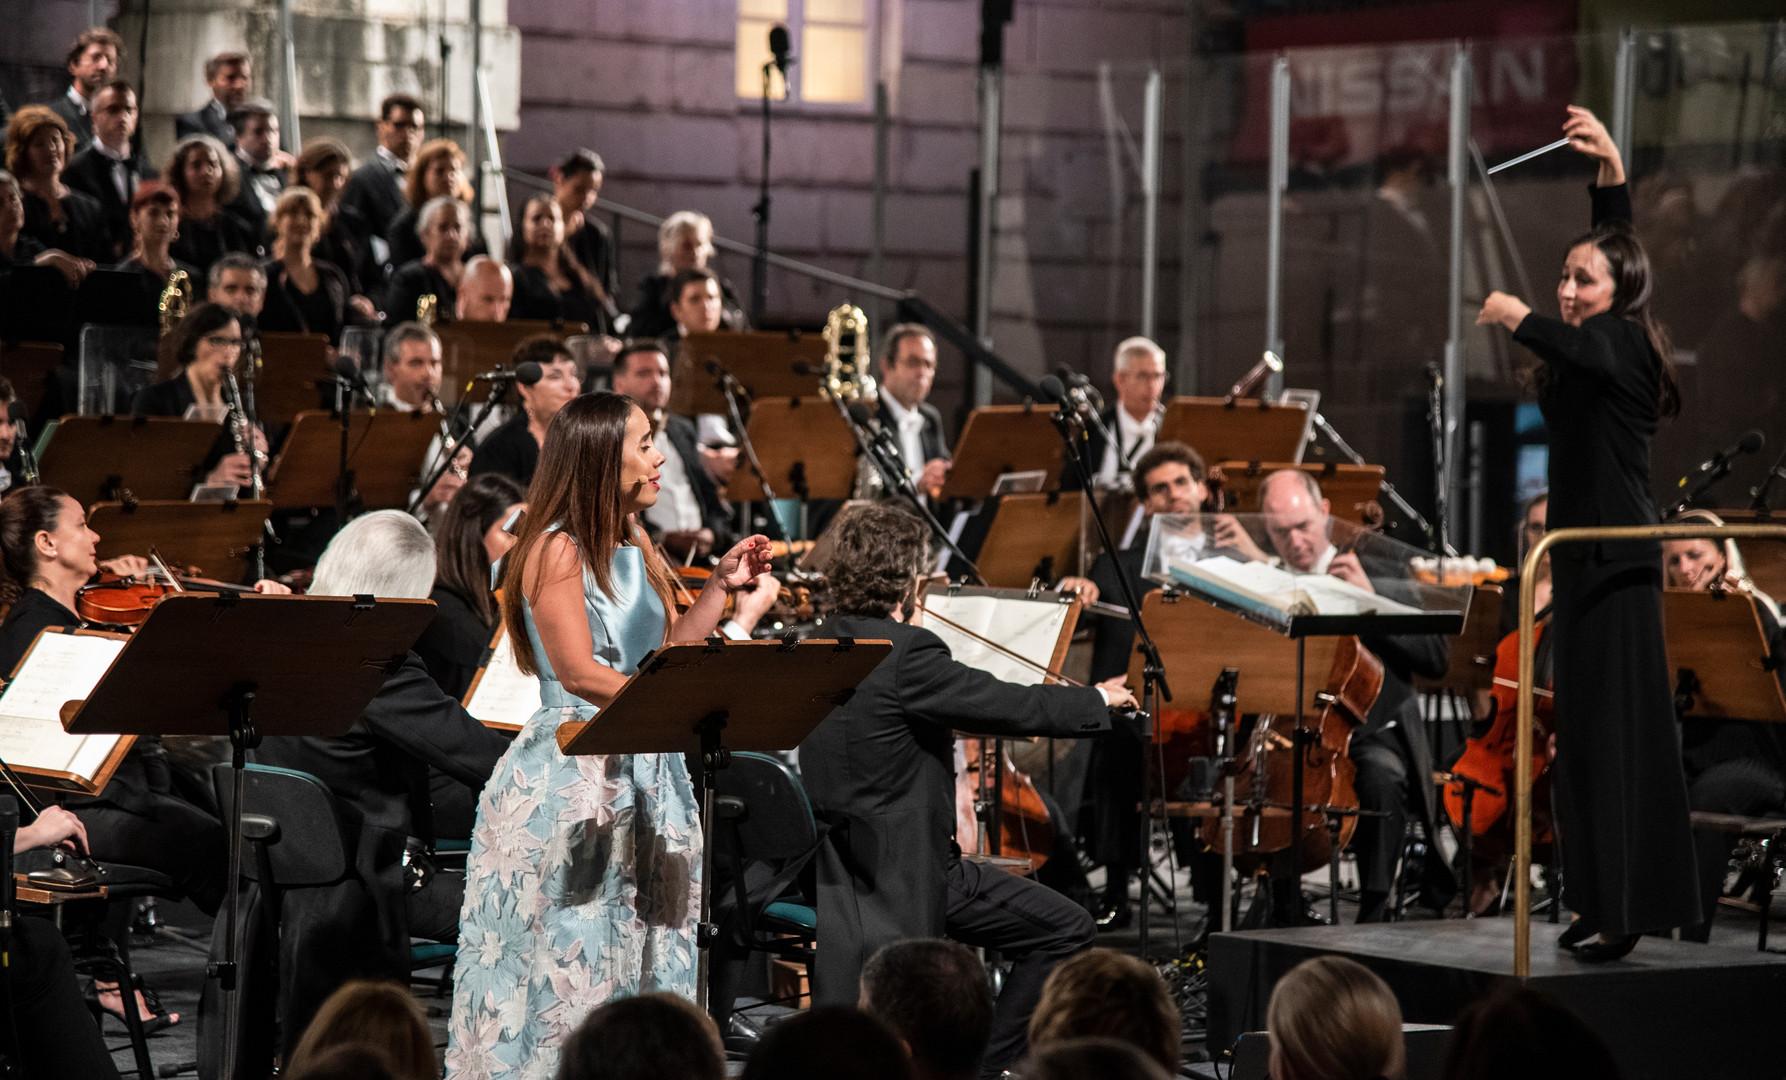 Lara MArtins w/ Orquestra Sinfónica Portuguesa (dir. Joana Carneiro), 2019.